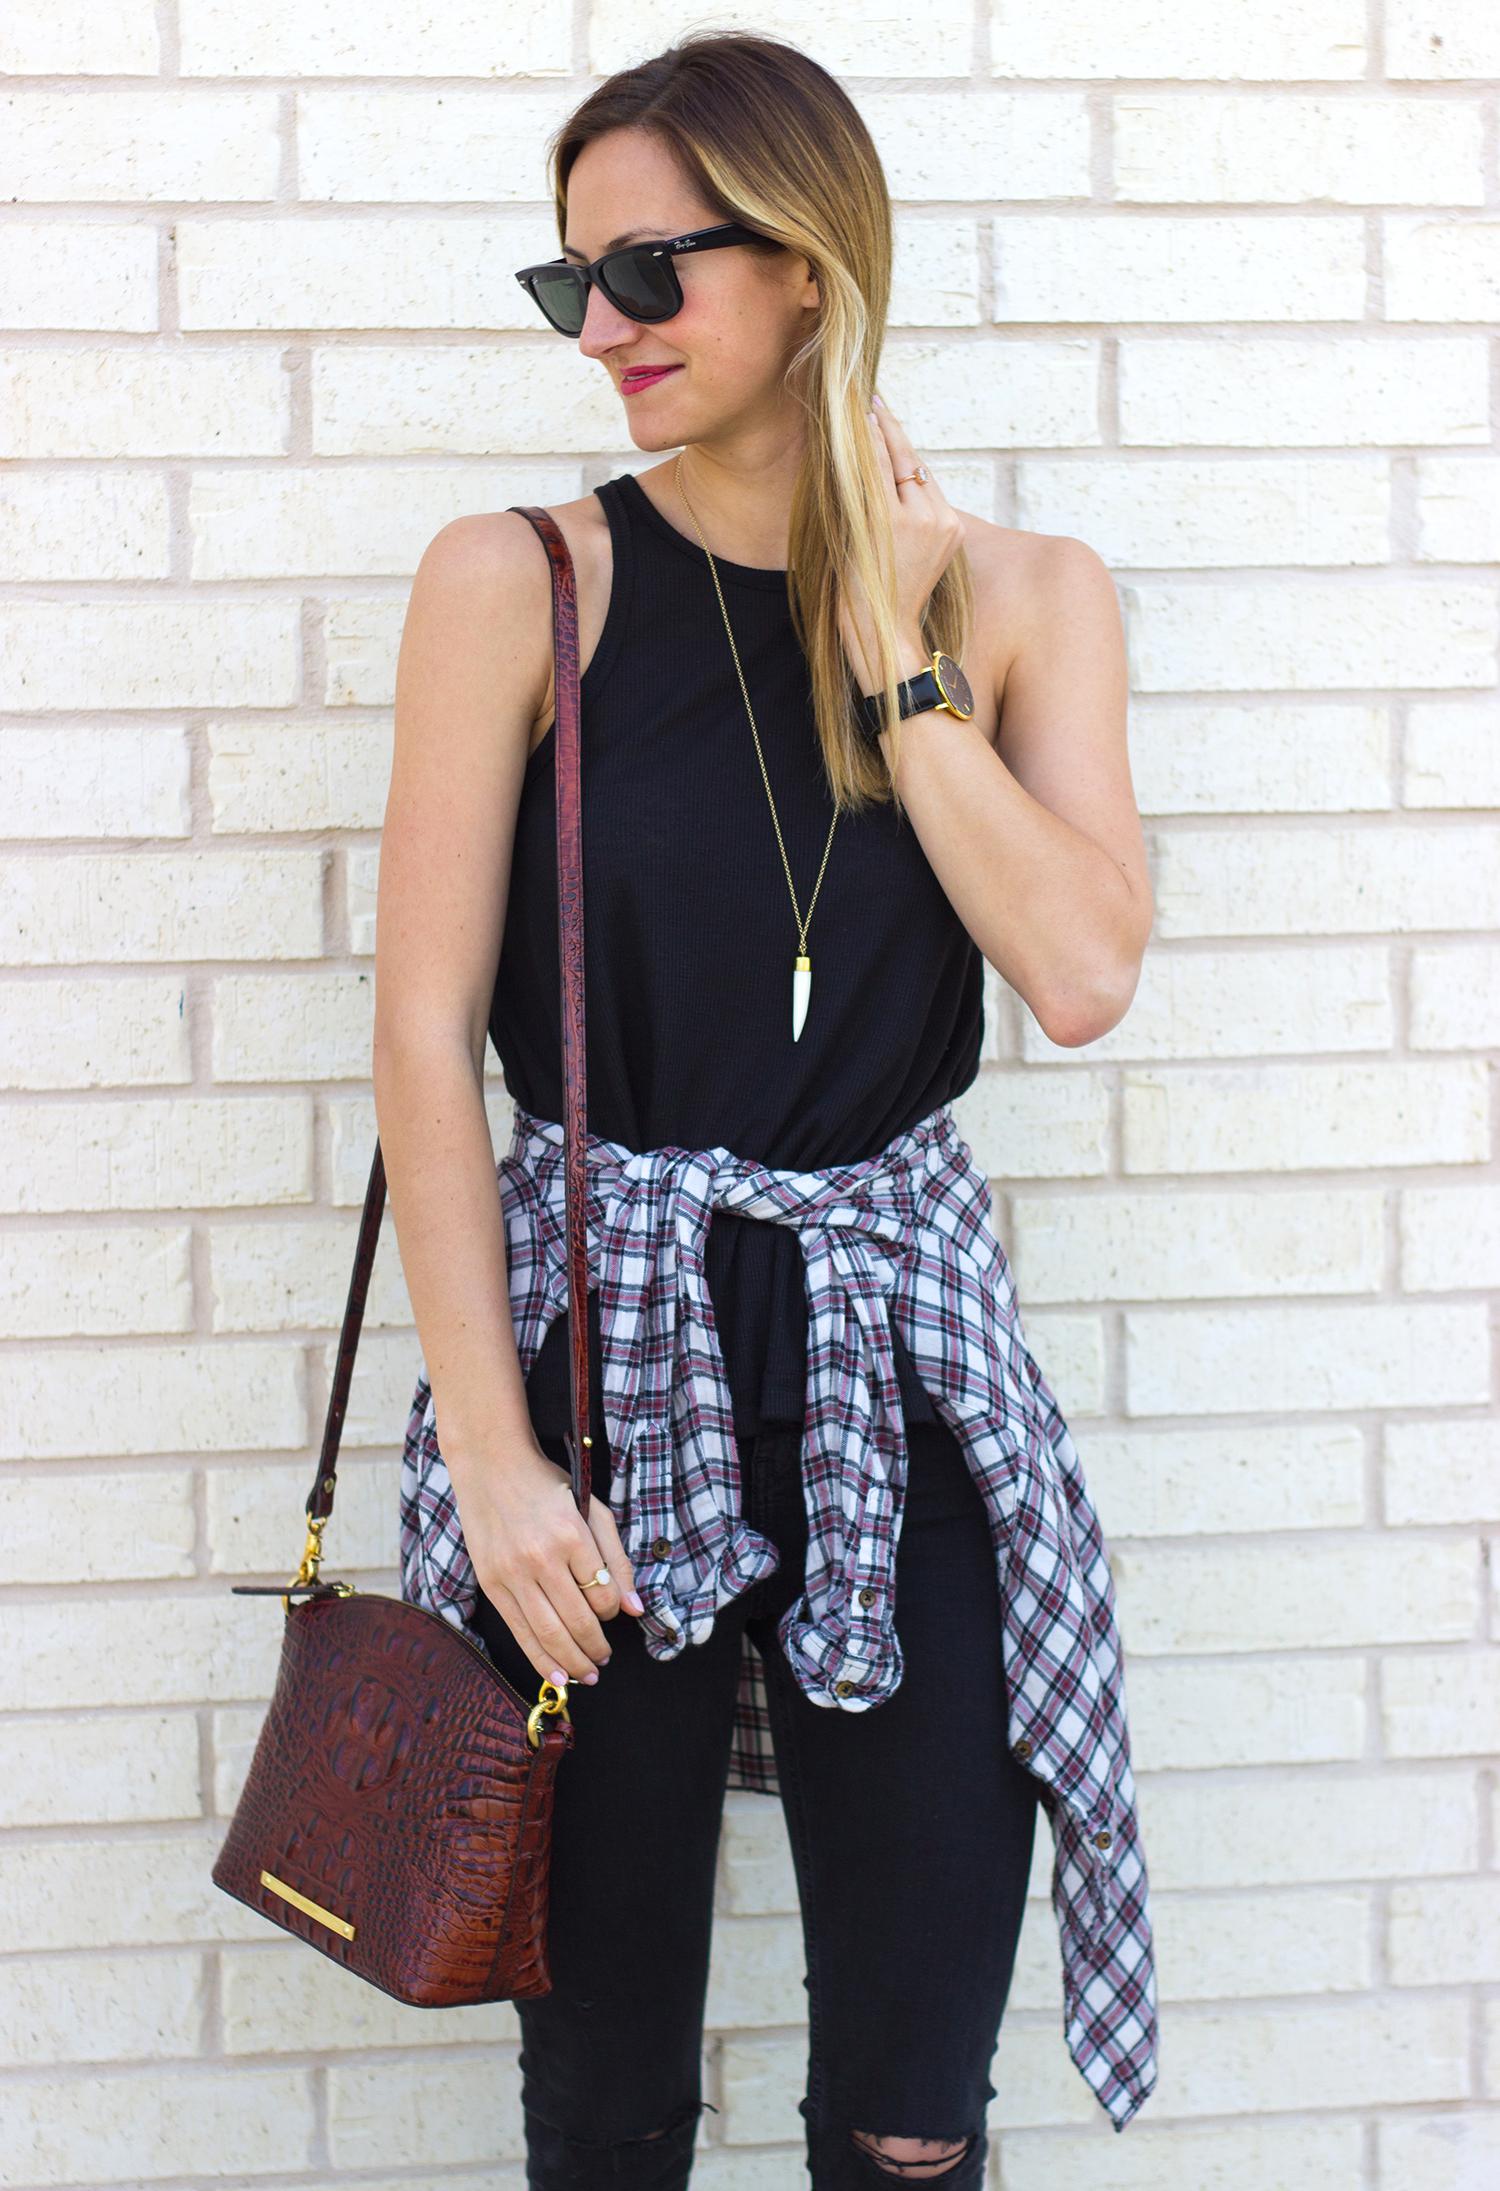 livvyland-blog-olivia-watson-austin-texas-fashion-blogger-free-people-razor-back-tank-top-black-on-black-boho-festival-outfit-sxsw-brahmin-duxbury-plaid-flannel-around-waist-seychelles-snare-7